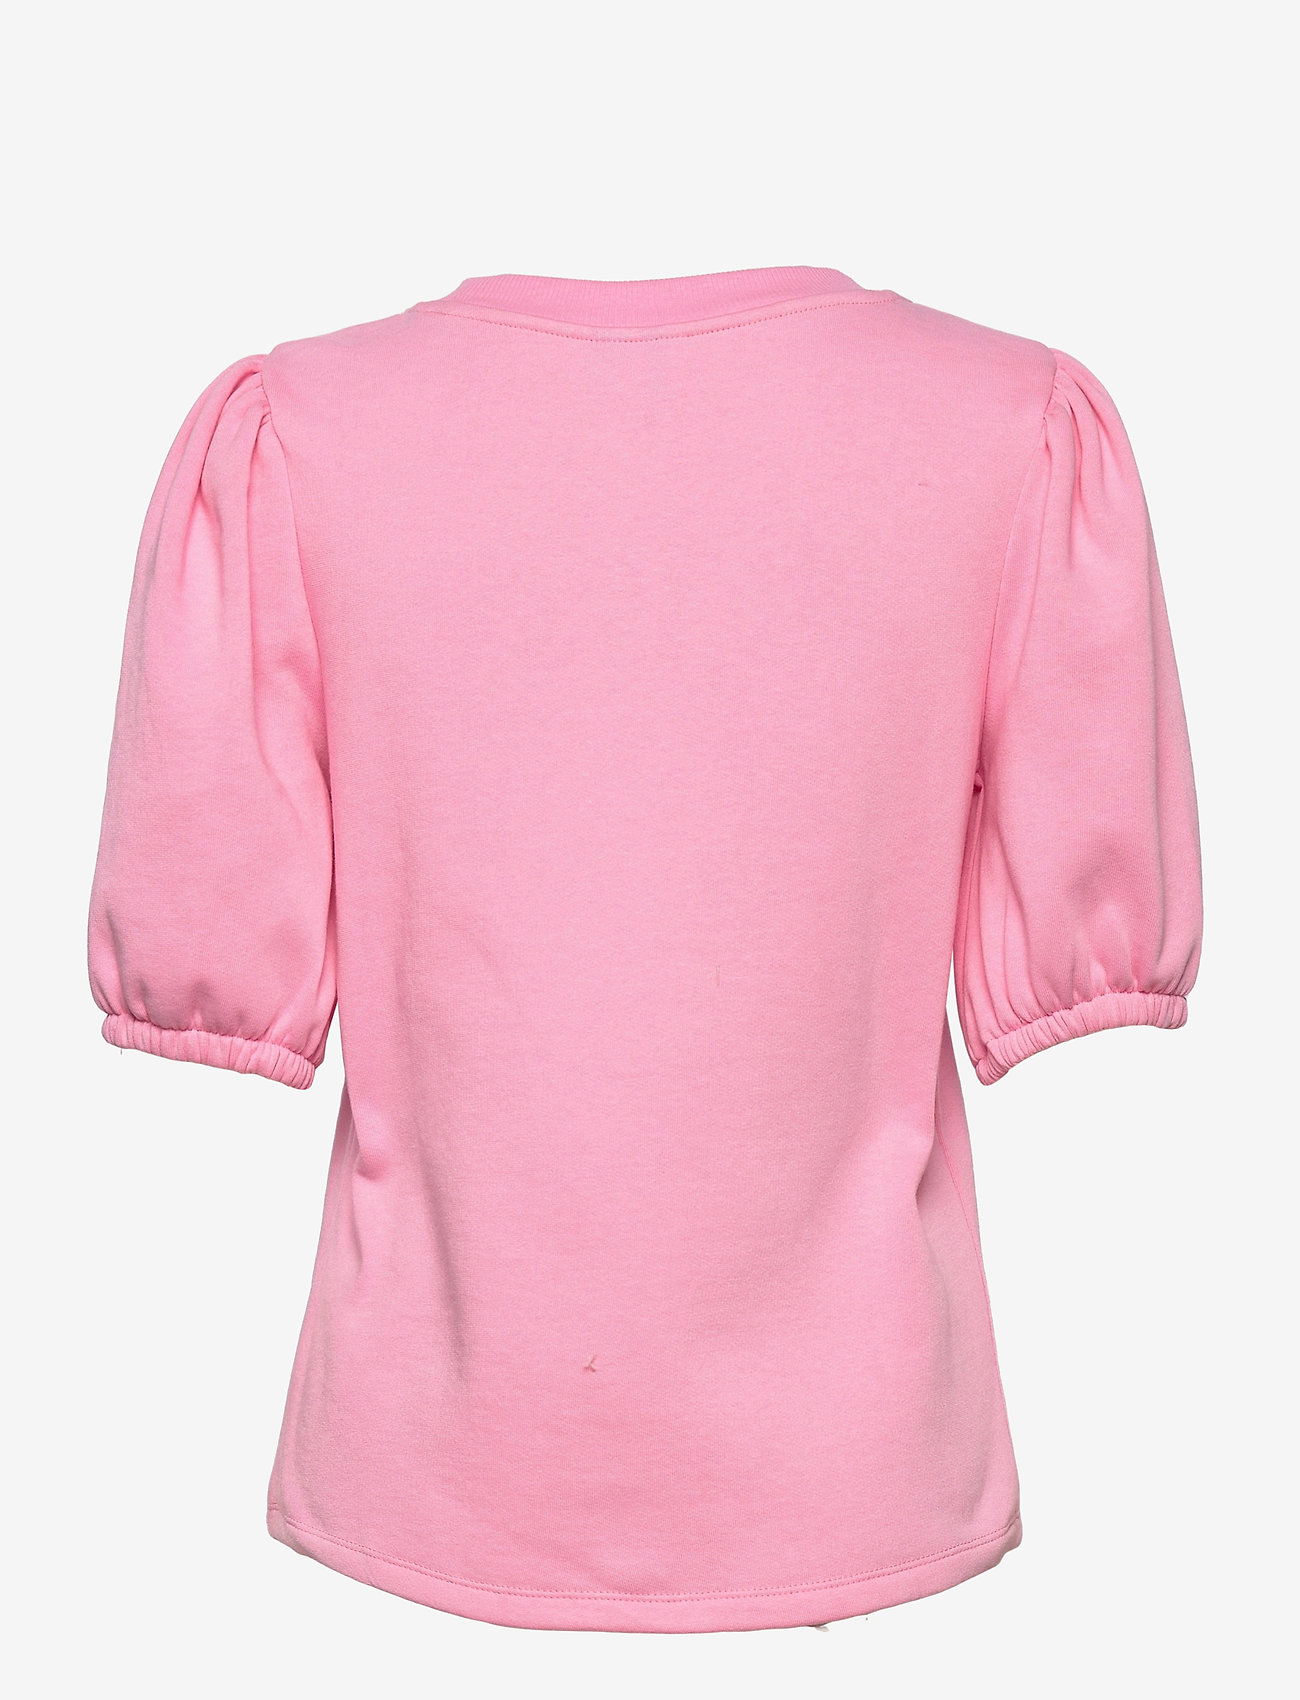 Vero Moda - VMDAISY S/S SWEAT EXP - långärmade blusar - prism pink - 1